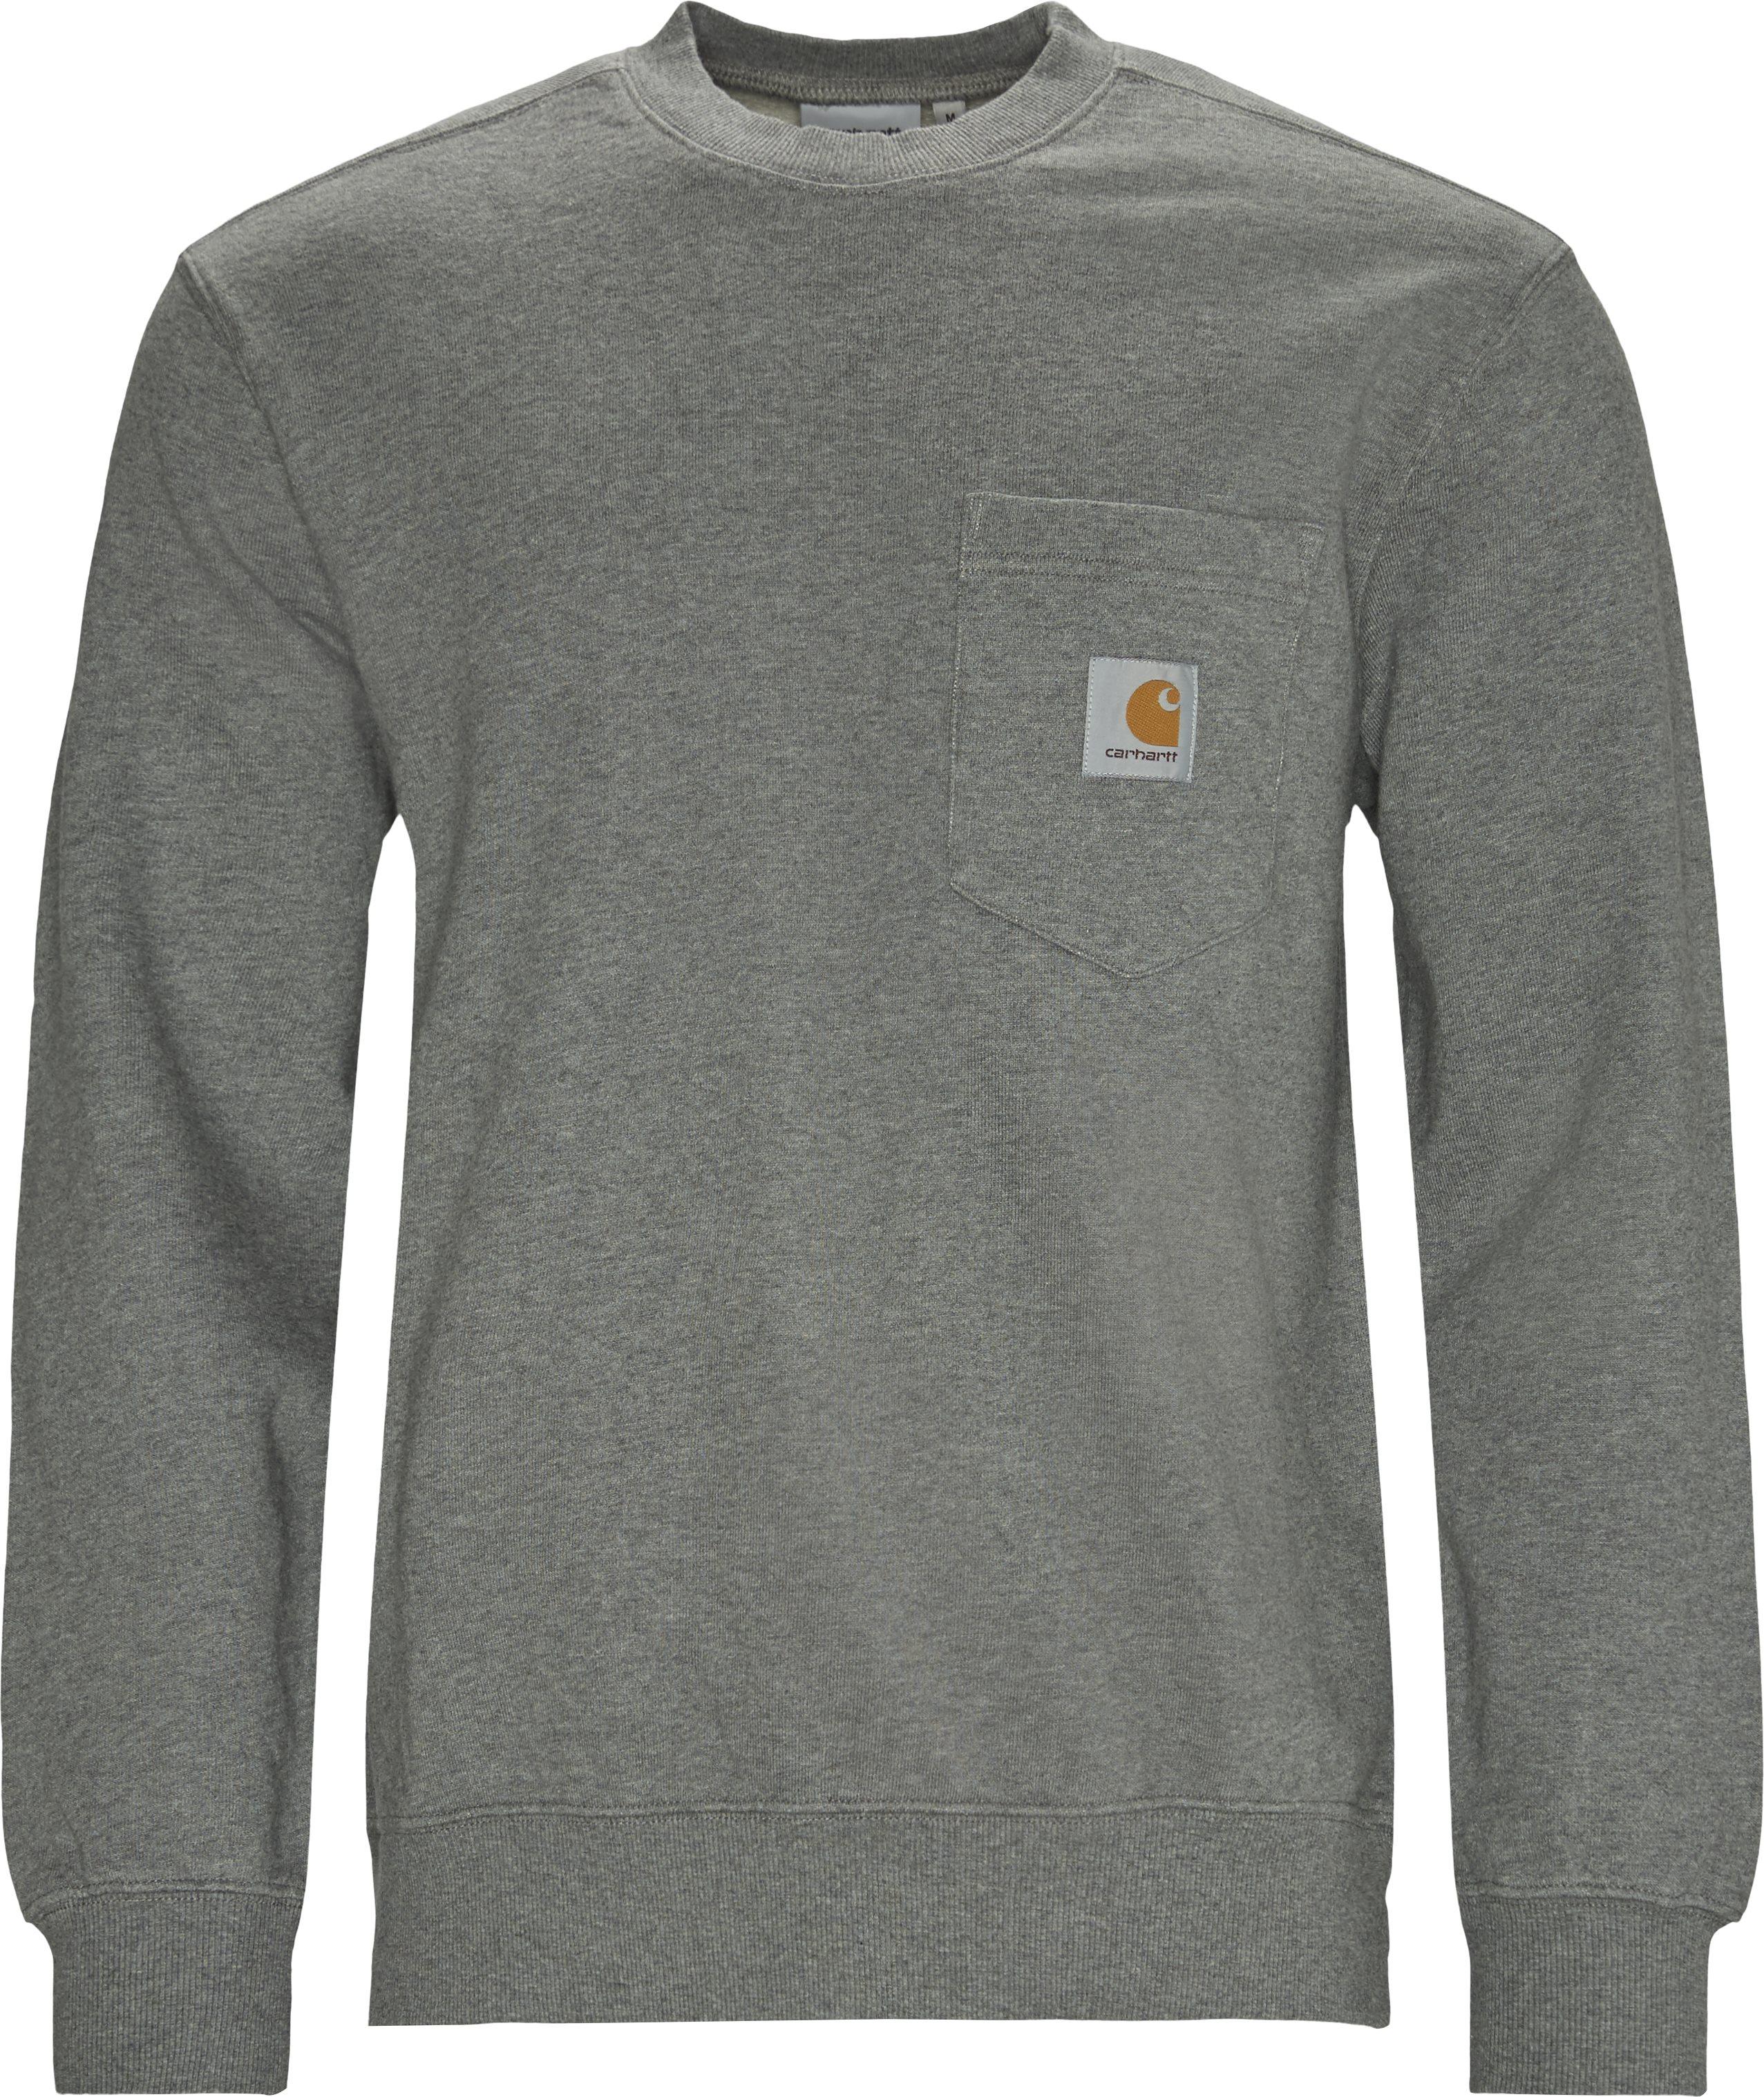 Pocket Sweatshirt - Sweatshirts - Regular - Grå